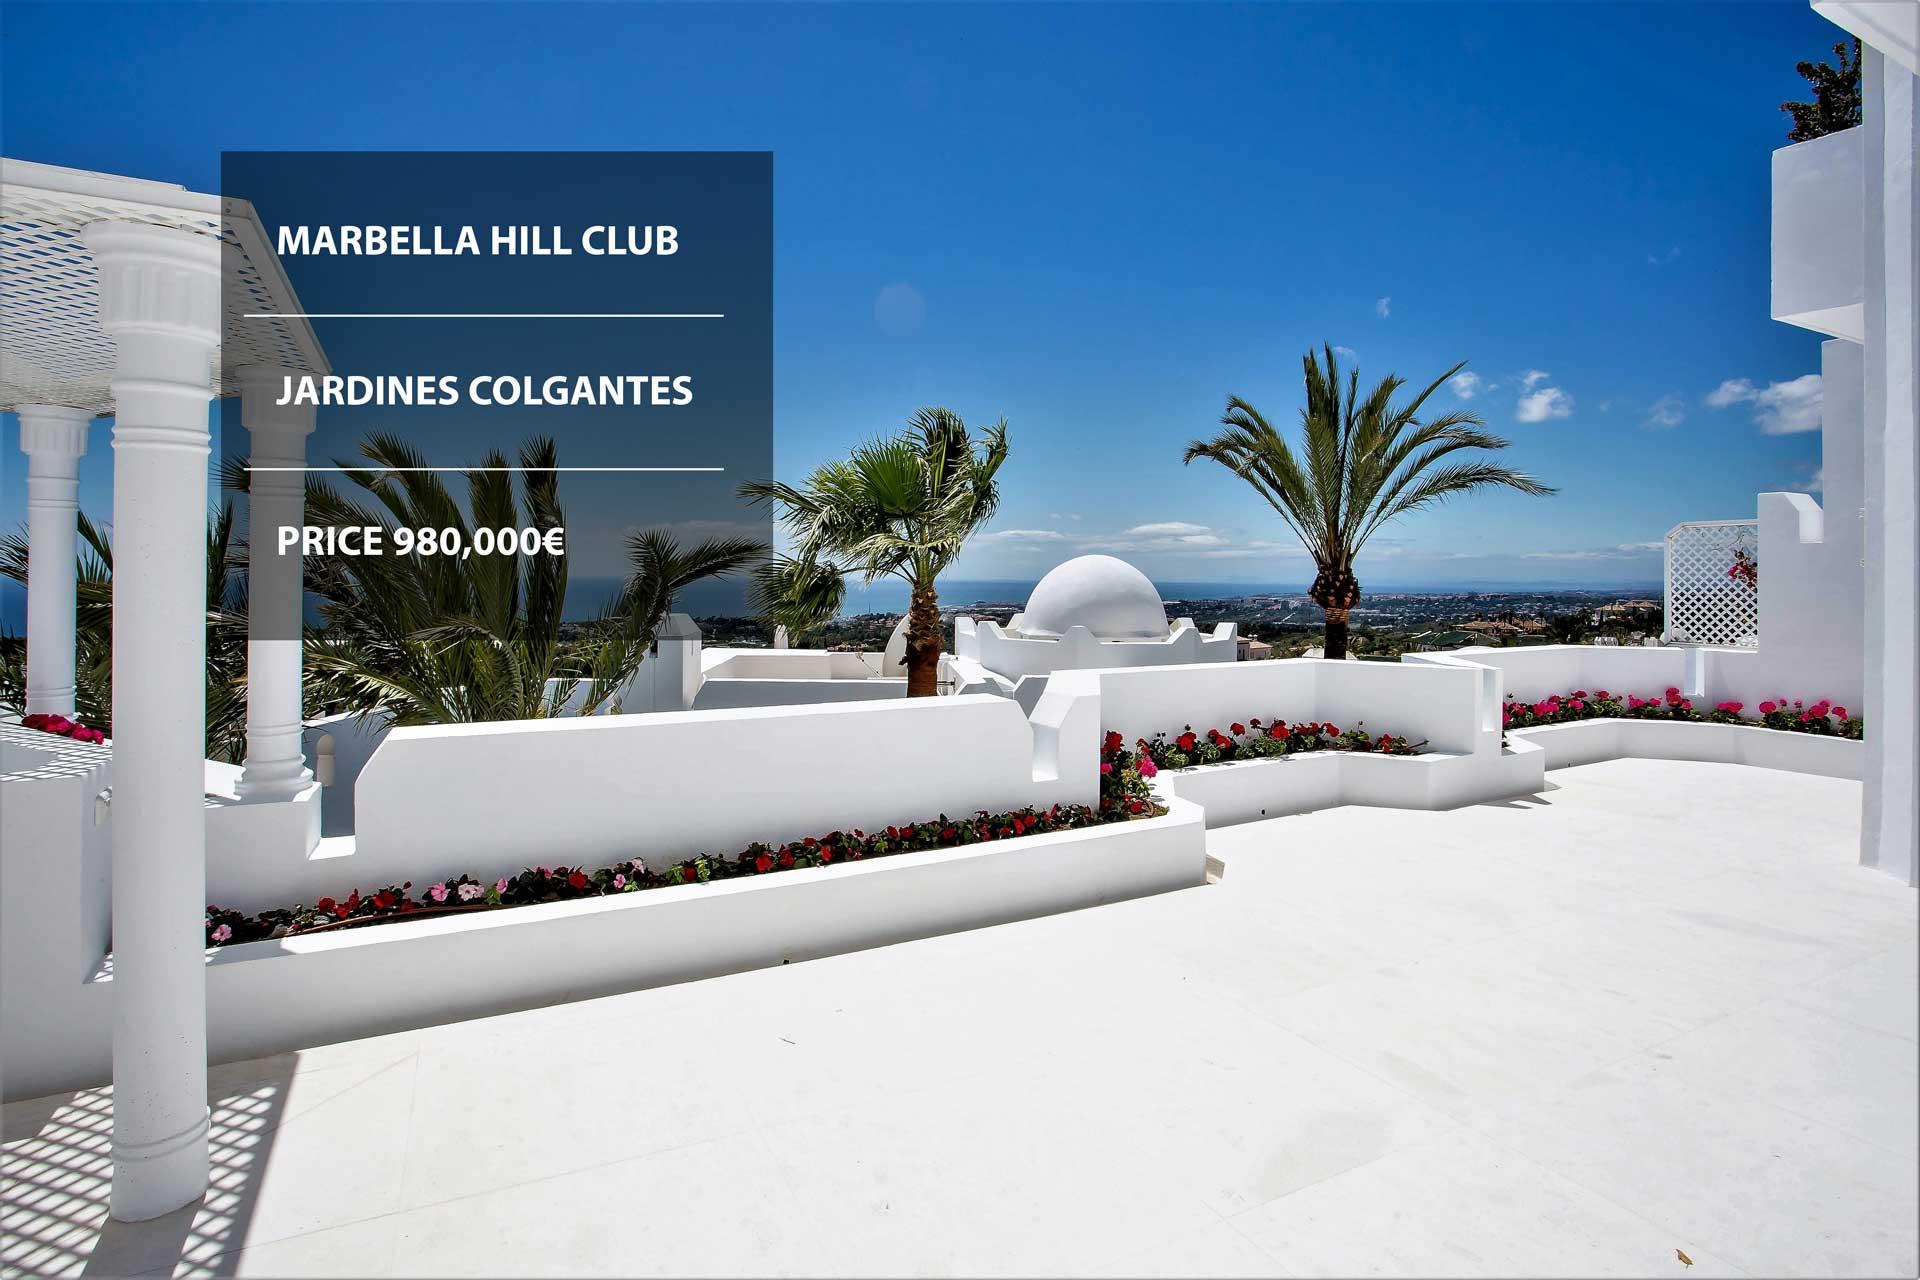 apartment-jardines-colgantes-marbella hill